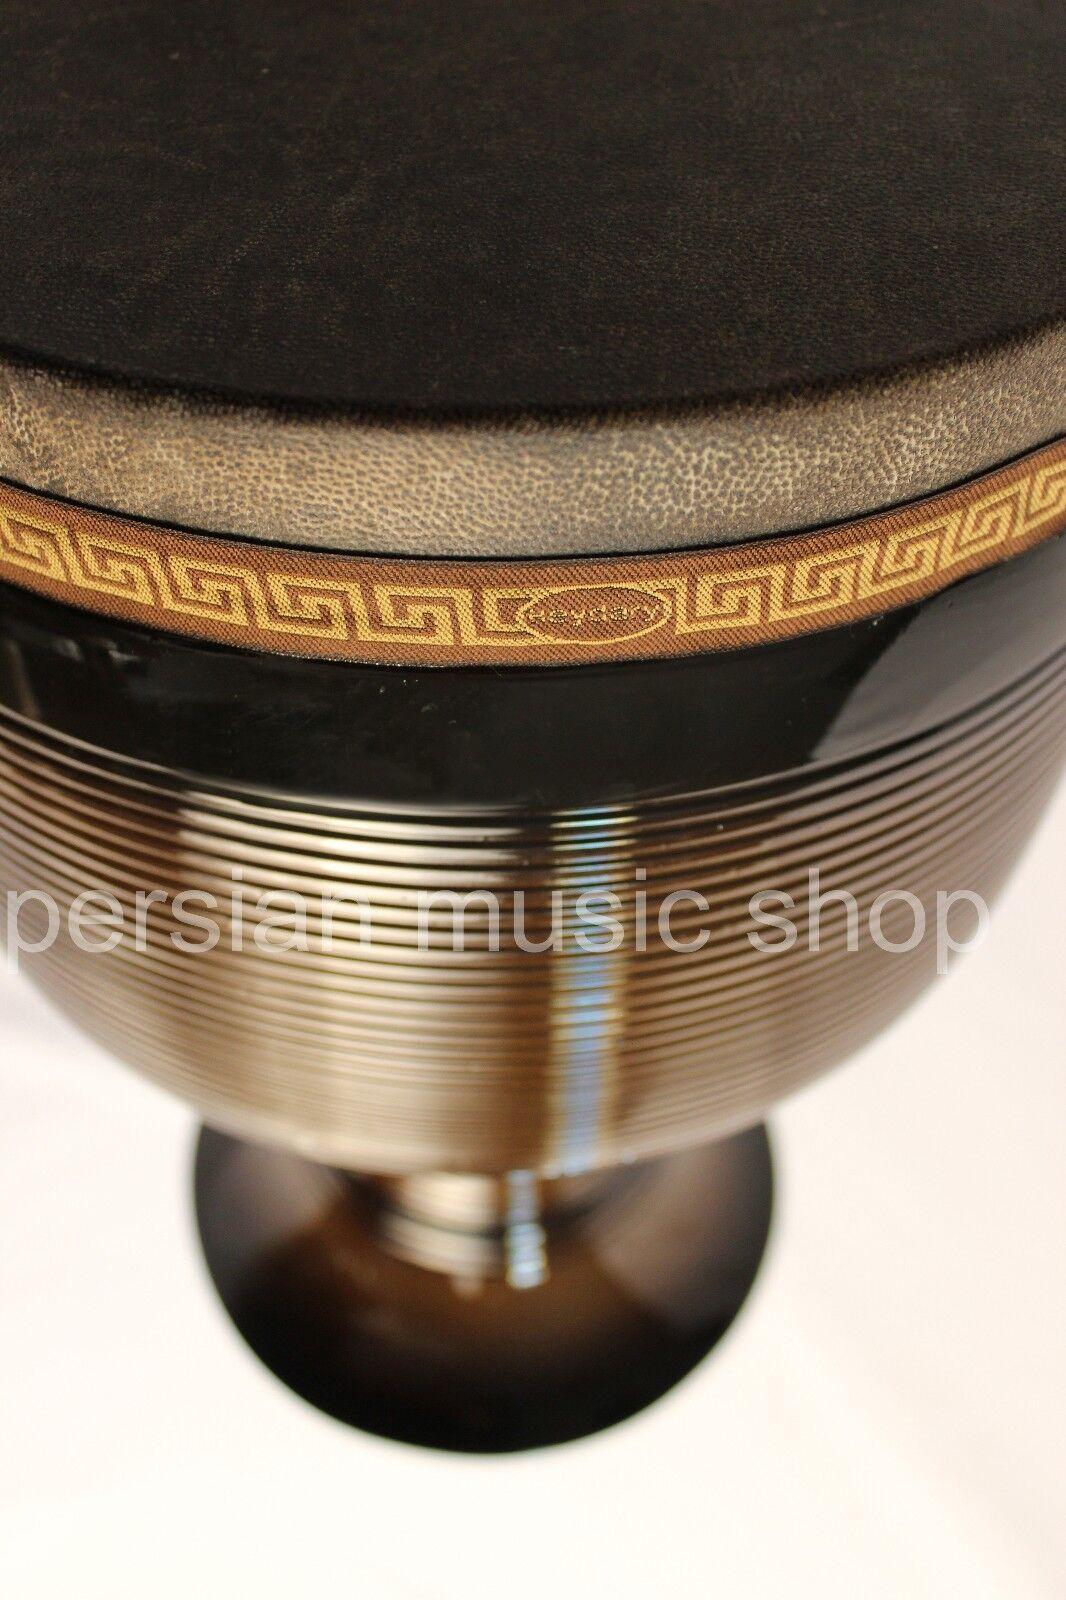 Electric /& Tuneable Tonbak Tombak Drum by Heydari